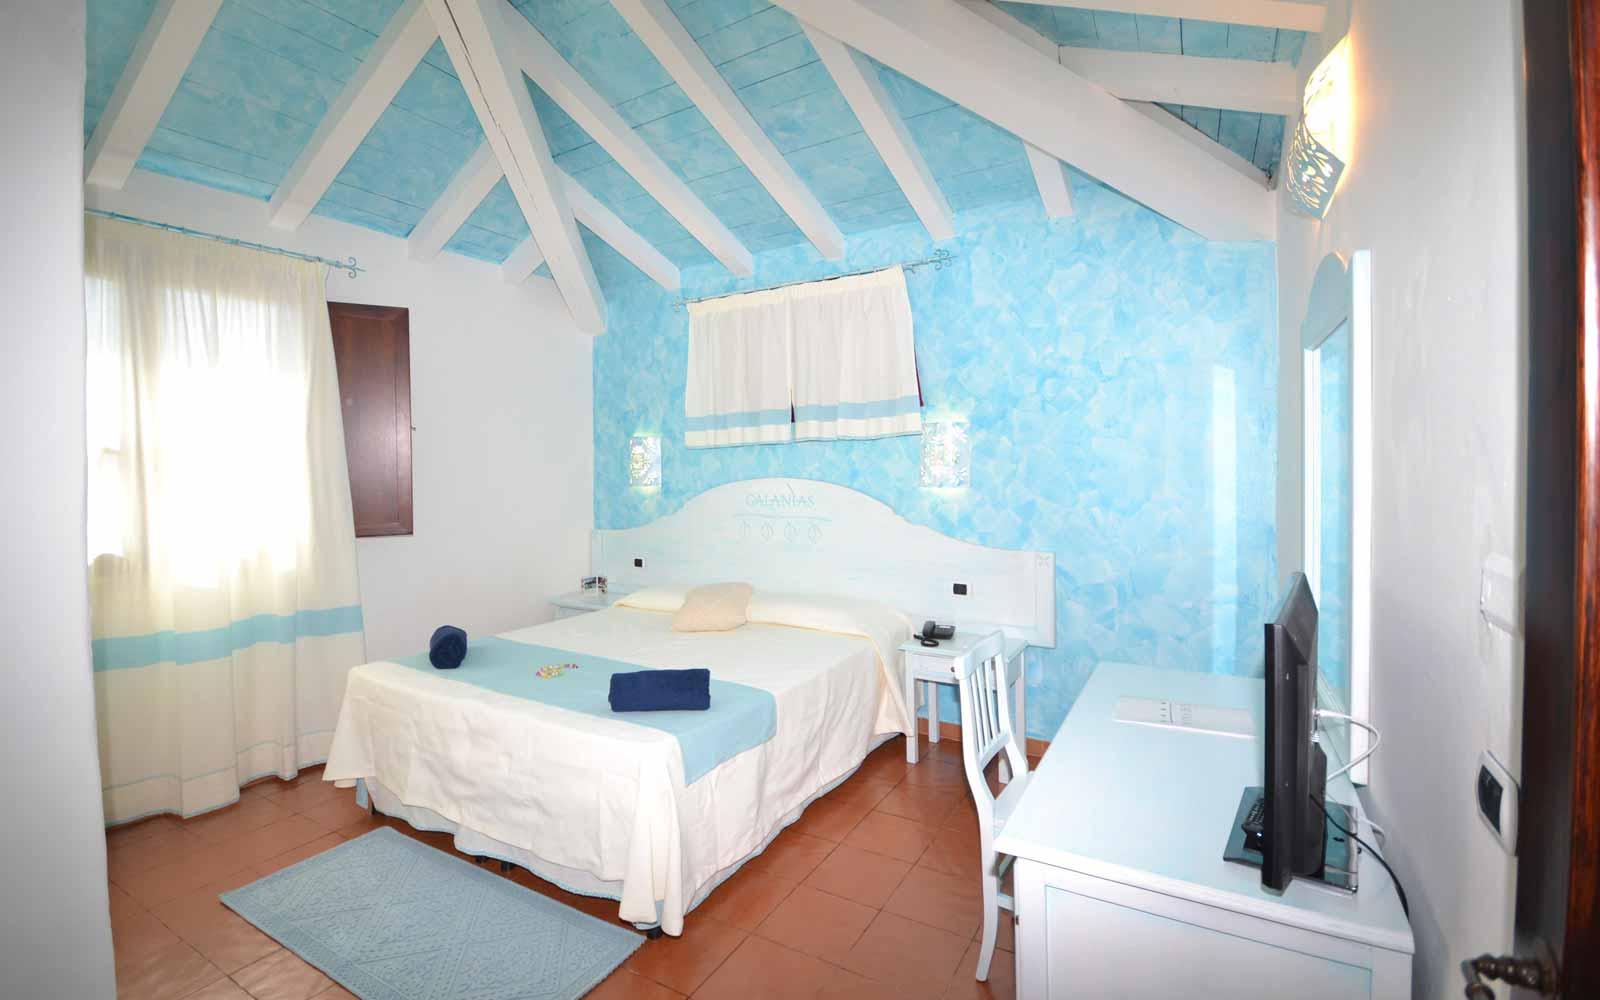 Superior room at Galanias Hotel